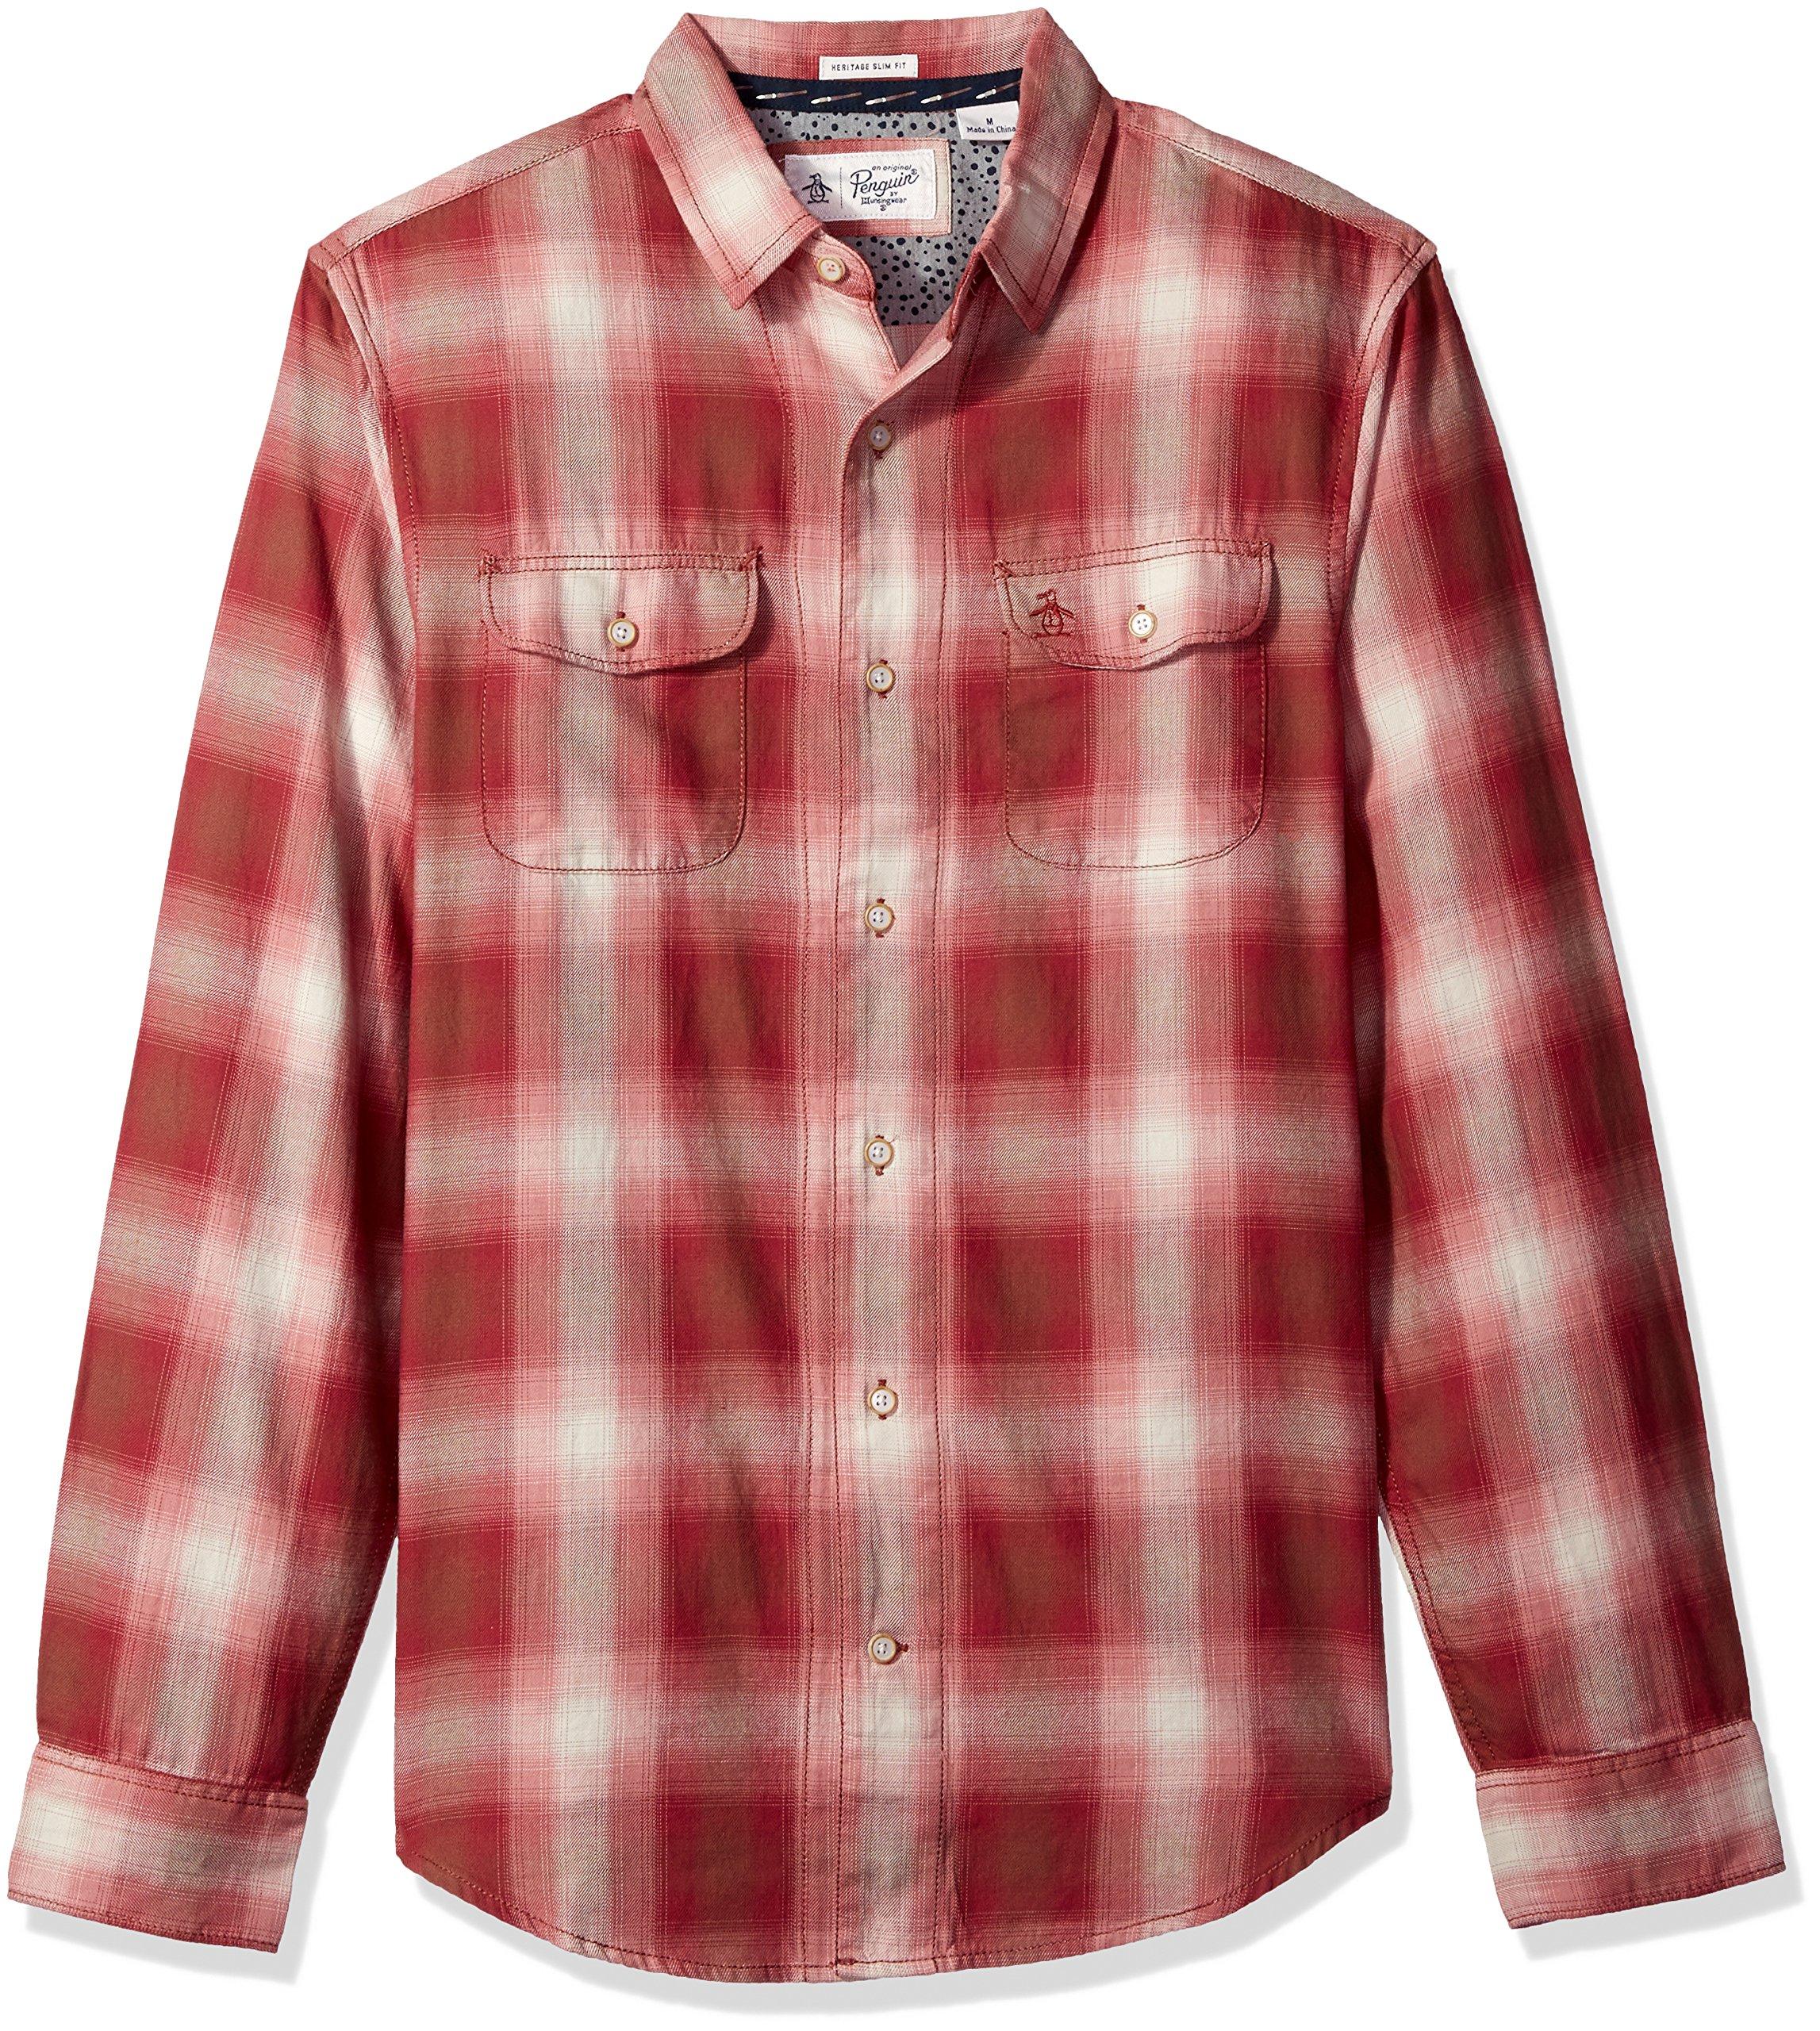 Original Penguin Men's Retro Plaid Flannel Dress Shirt, Pomegranate, Large